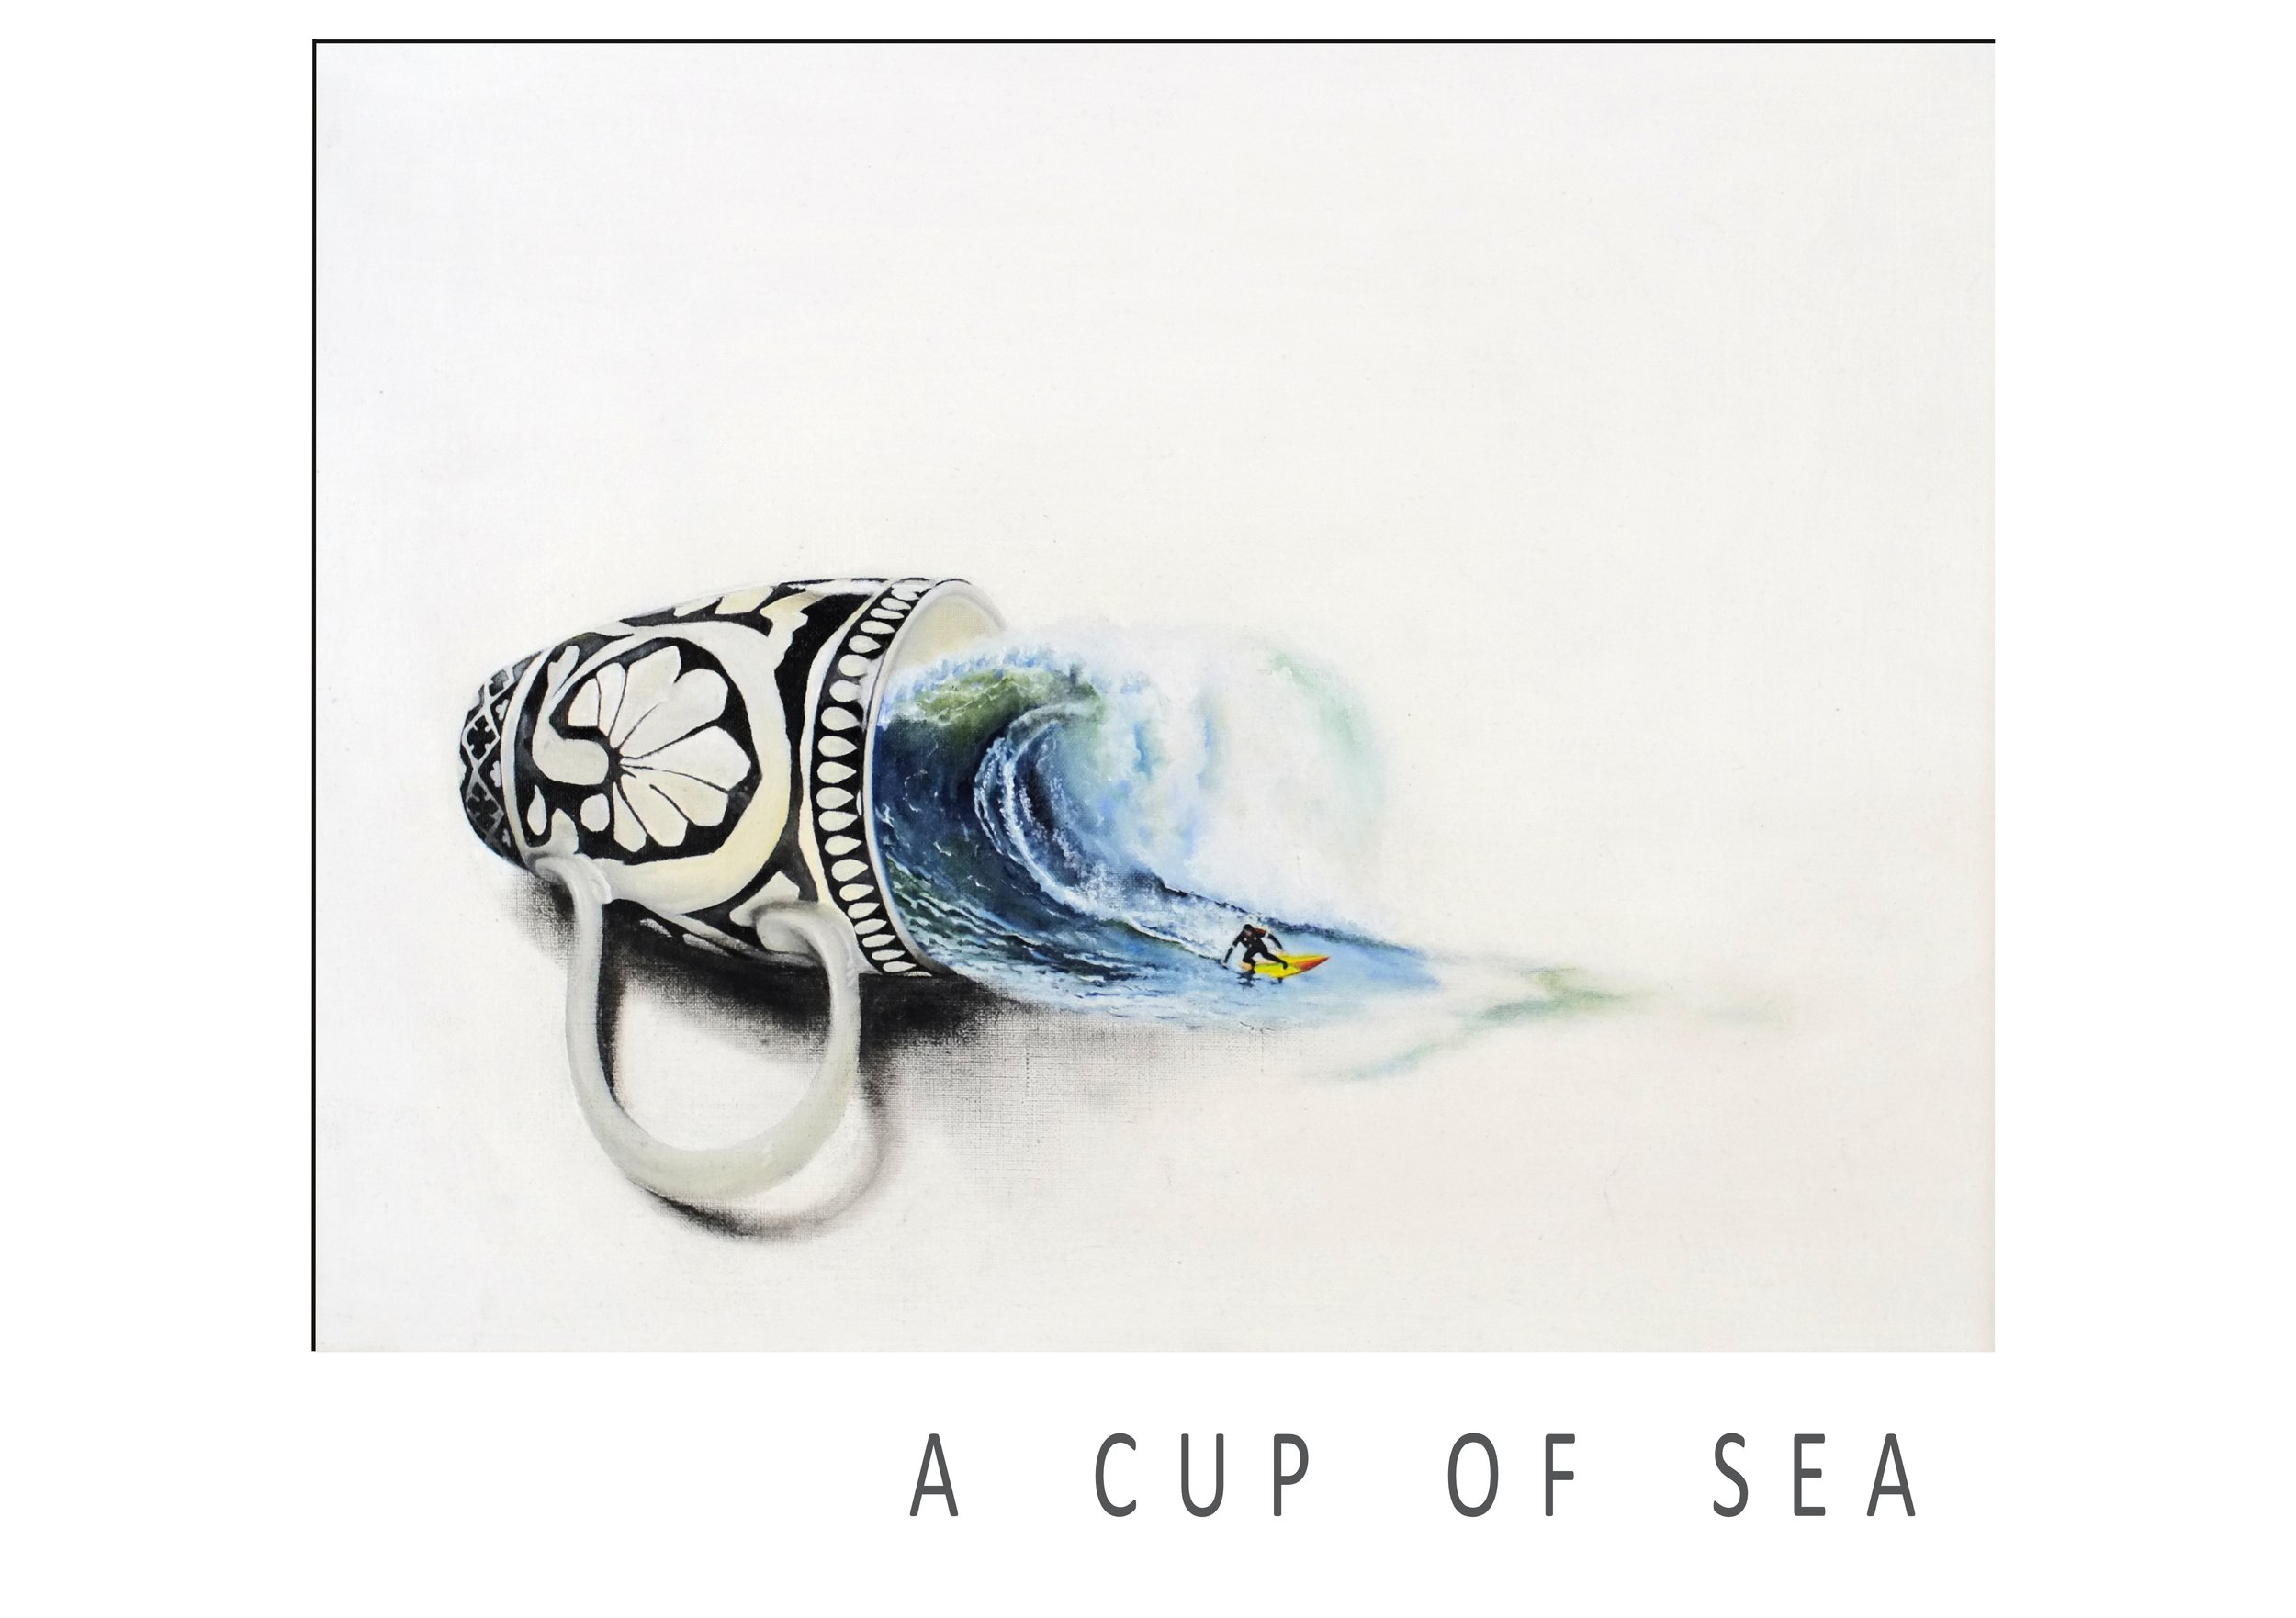 A CUP OF SEA-2-Pagina001.jpeg